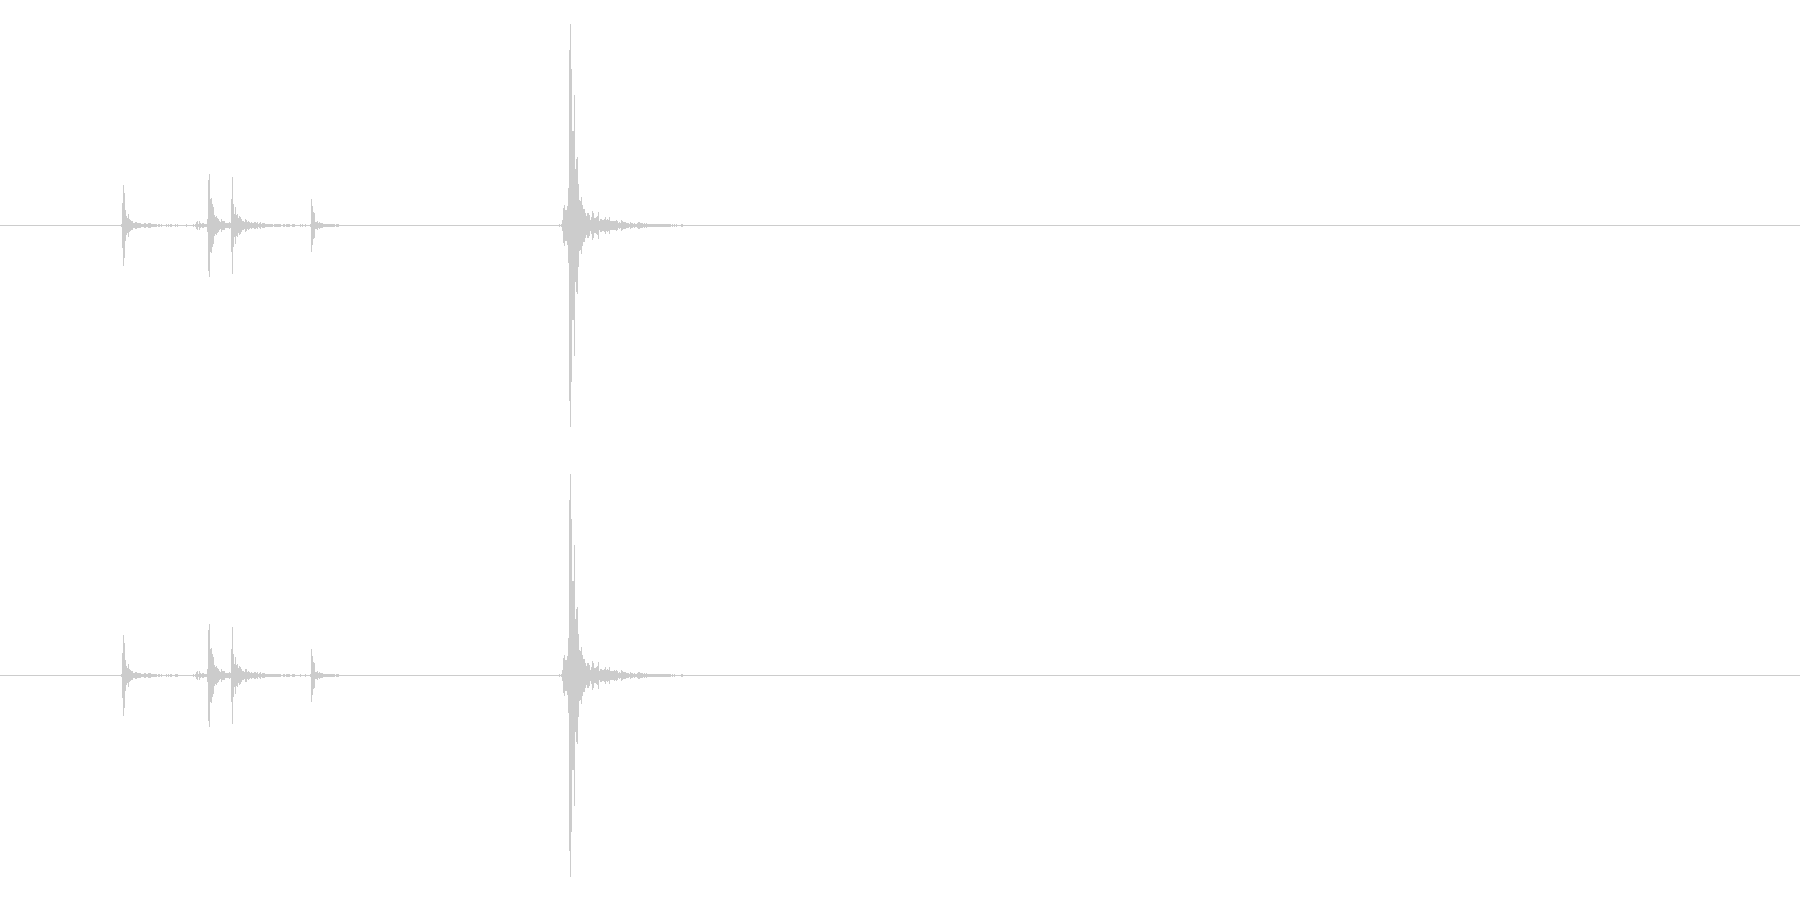 PC ハードウェア01-04(USB 抜の未再生の波形